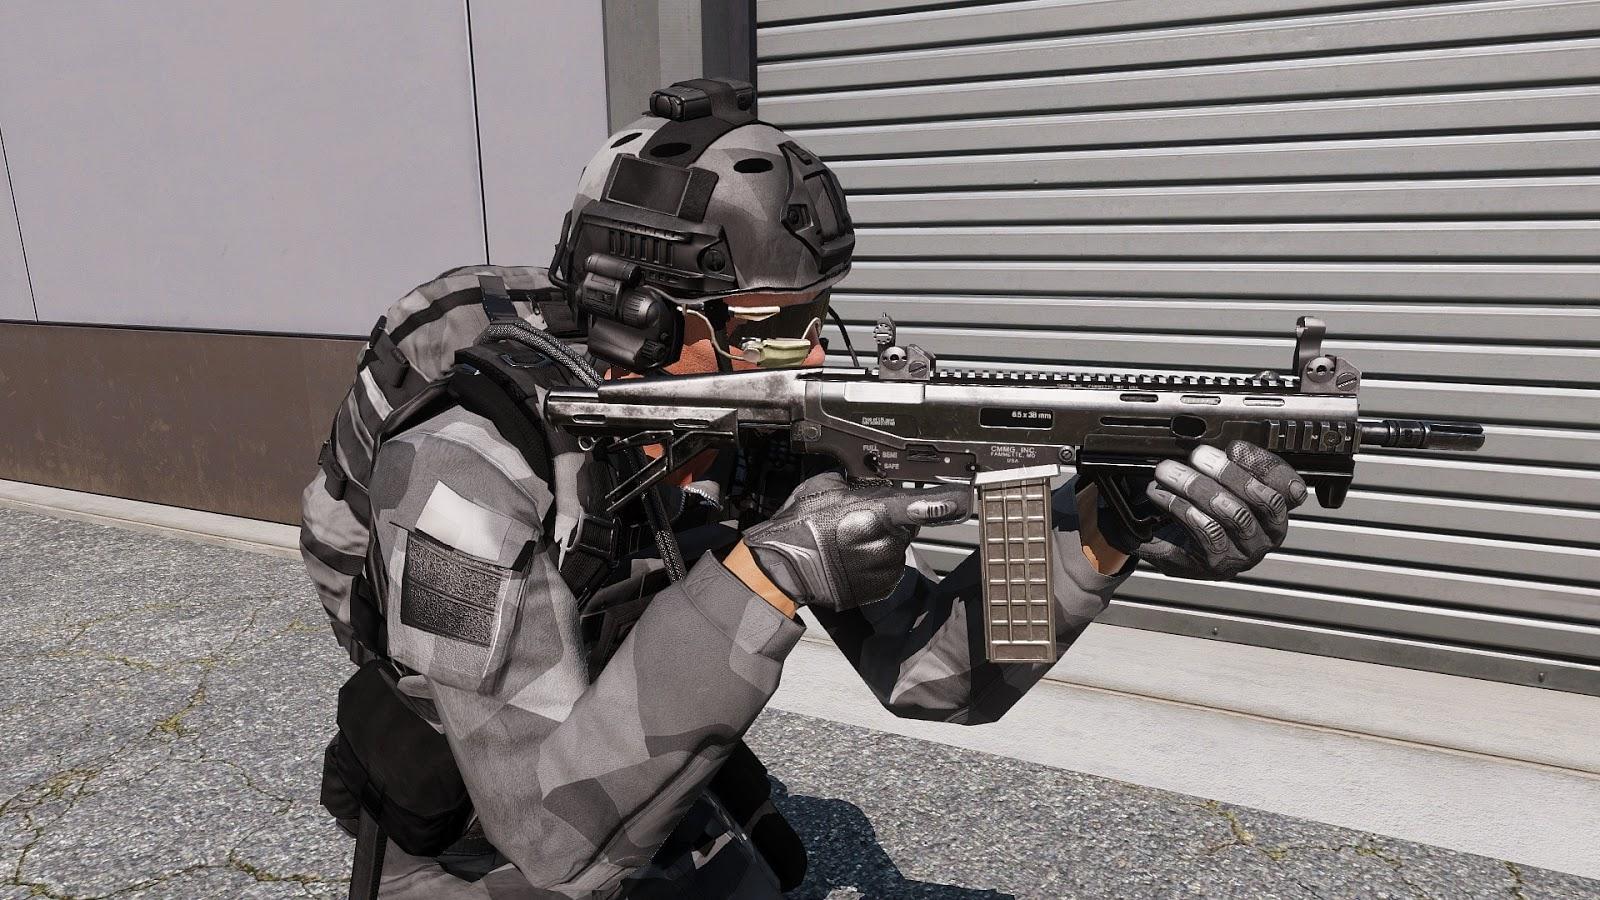 Arma3用スピリンター迷彩アドオン